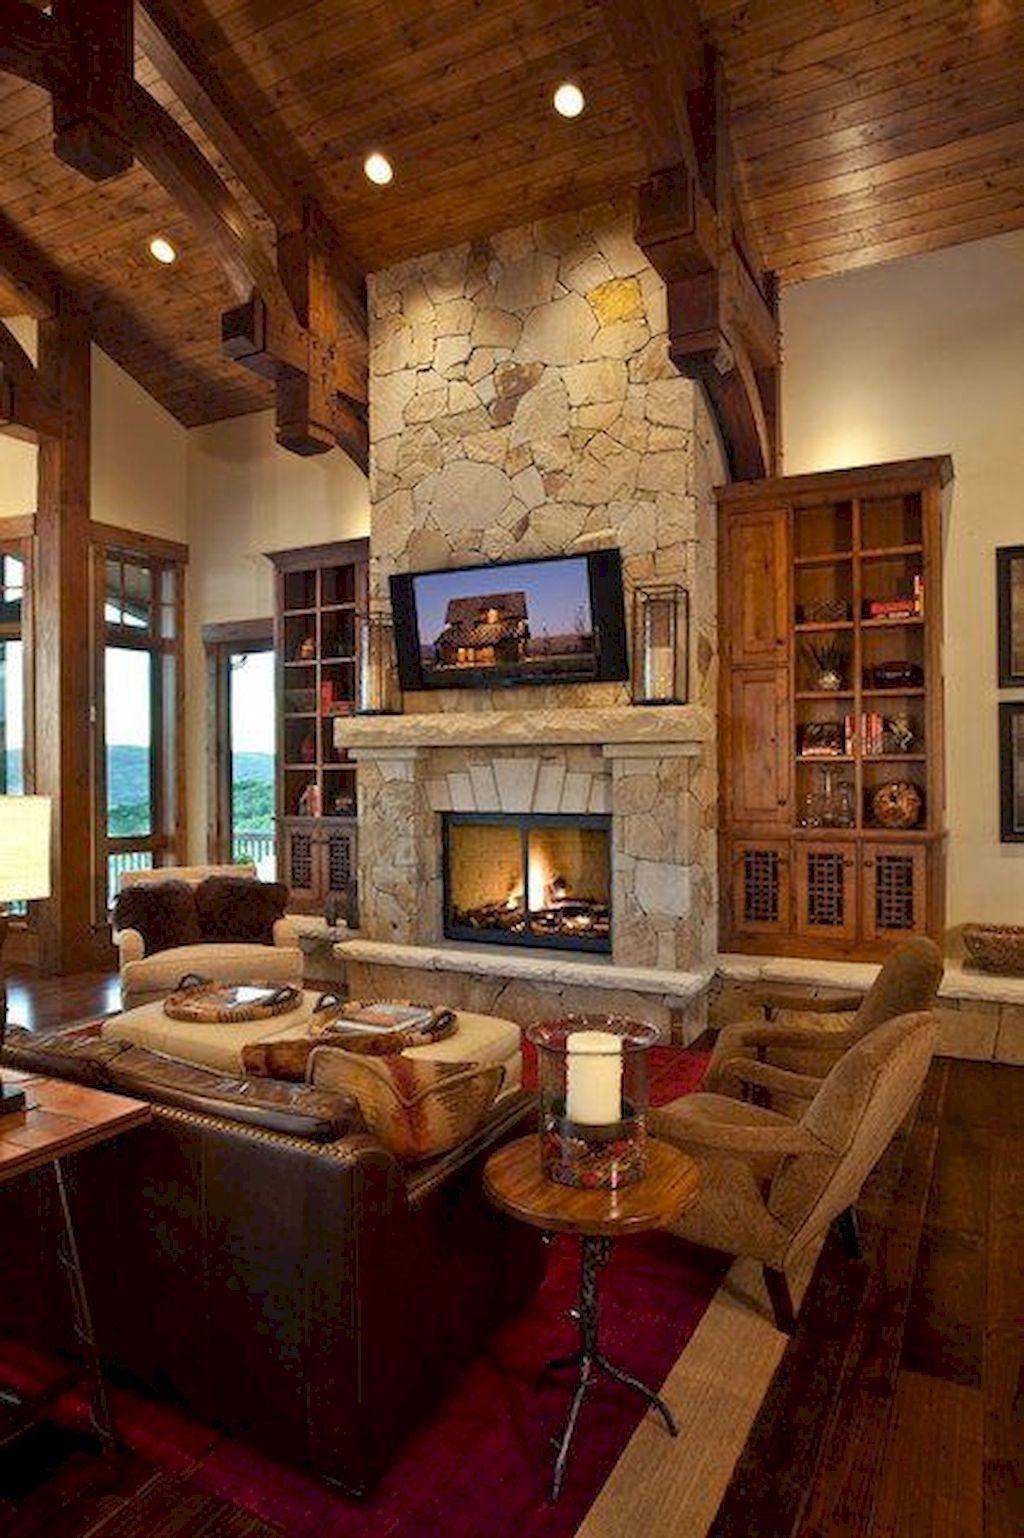 13 cozy farmhouse living room decor ideas - HomeSpecially ...